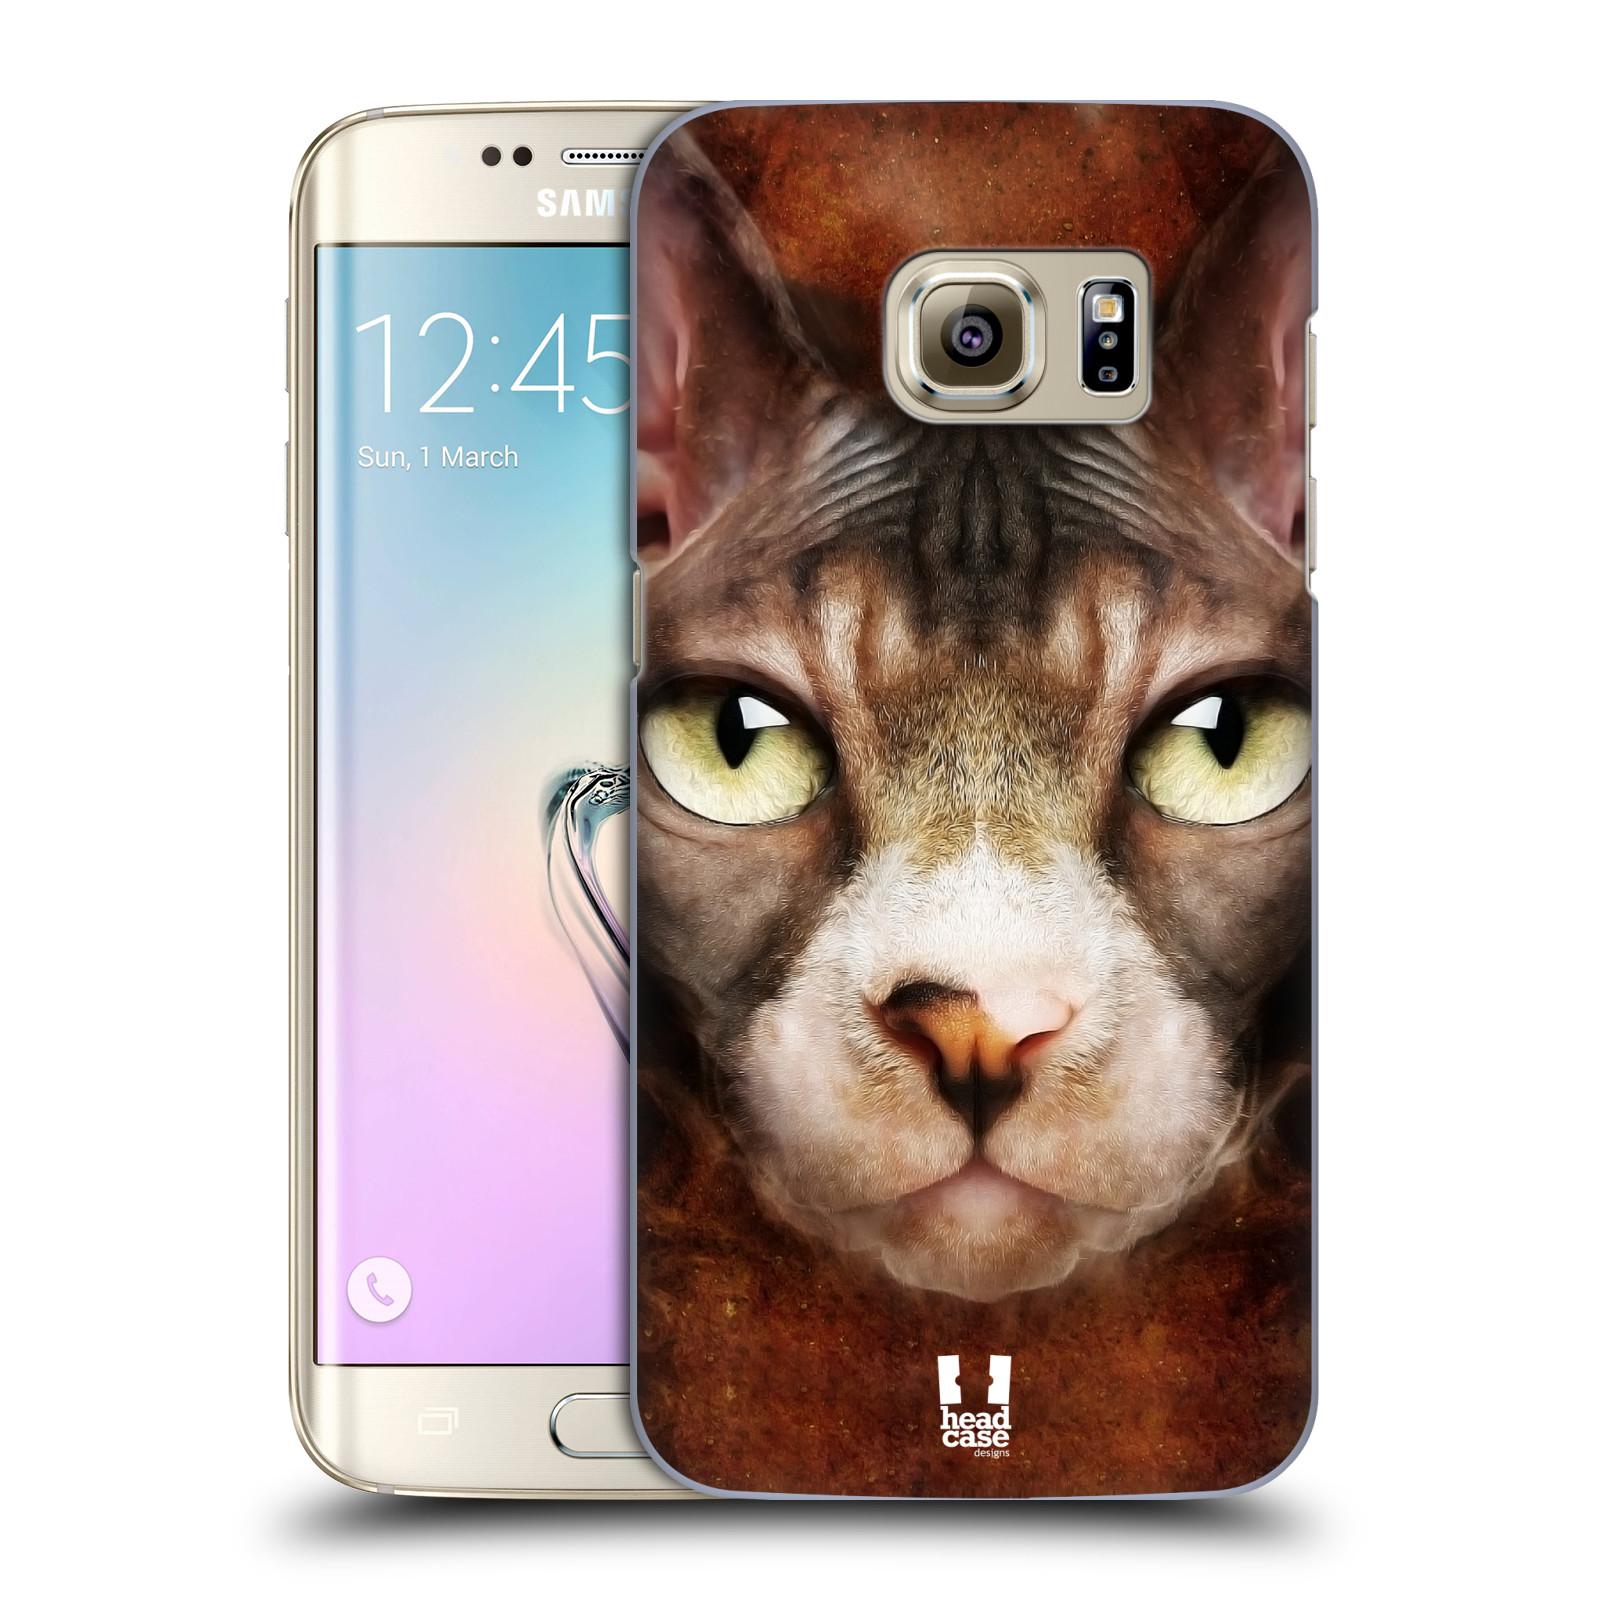 HEAD CASE plastový obal na mobil SAMSUNG GALAXY S7 EDGE vzor Zvířecí tváře kočka sphynx